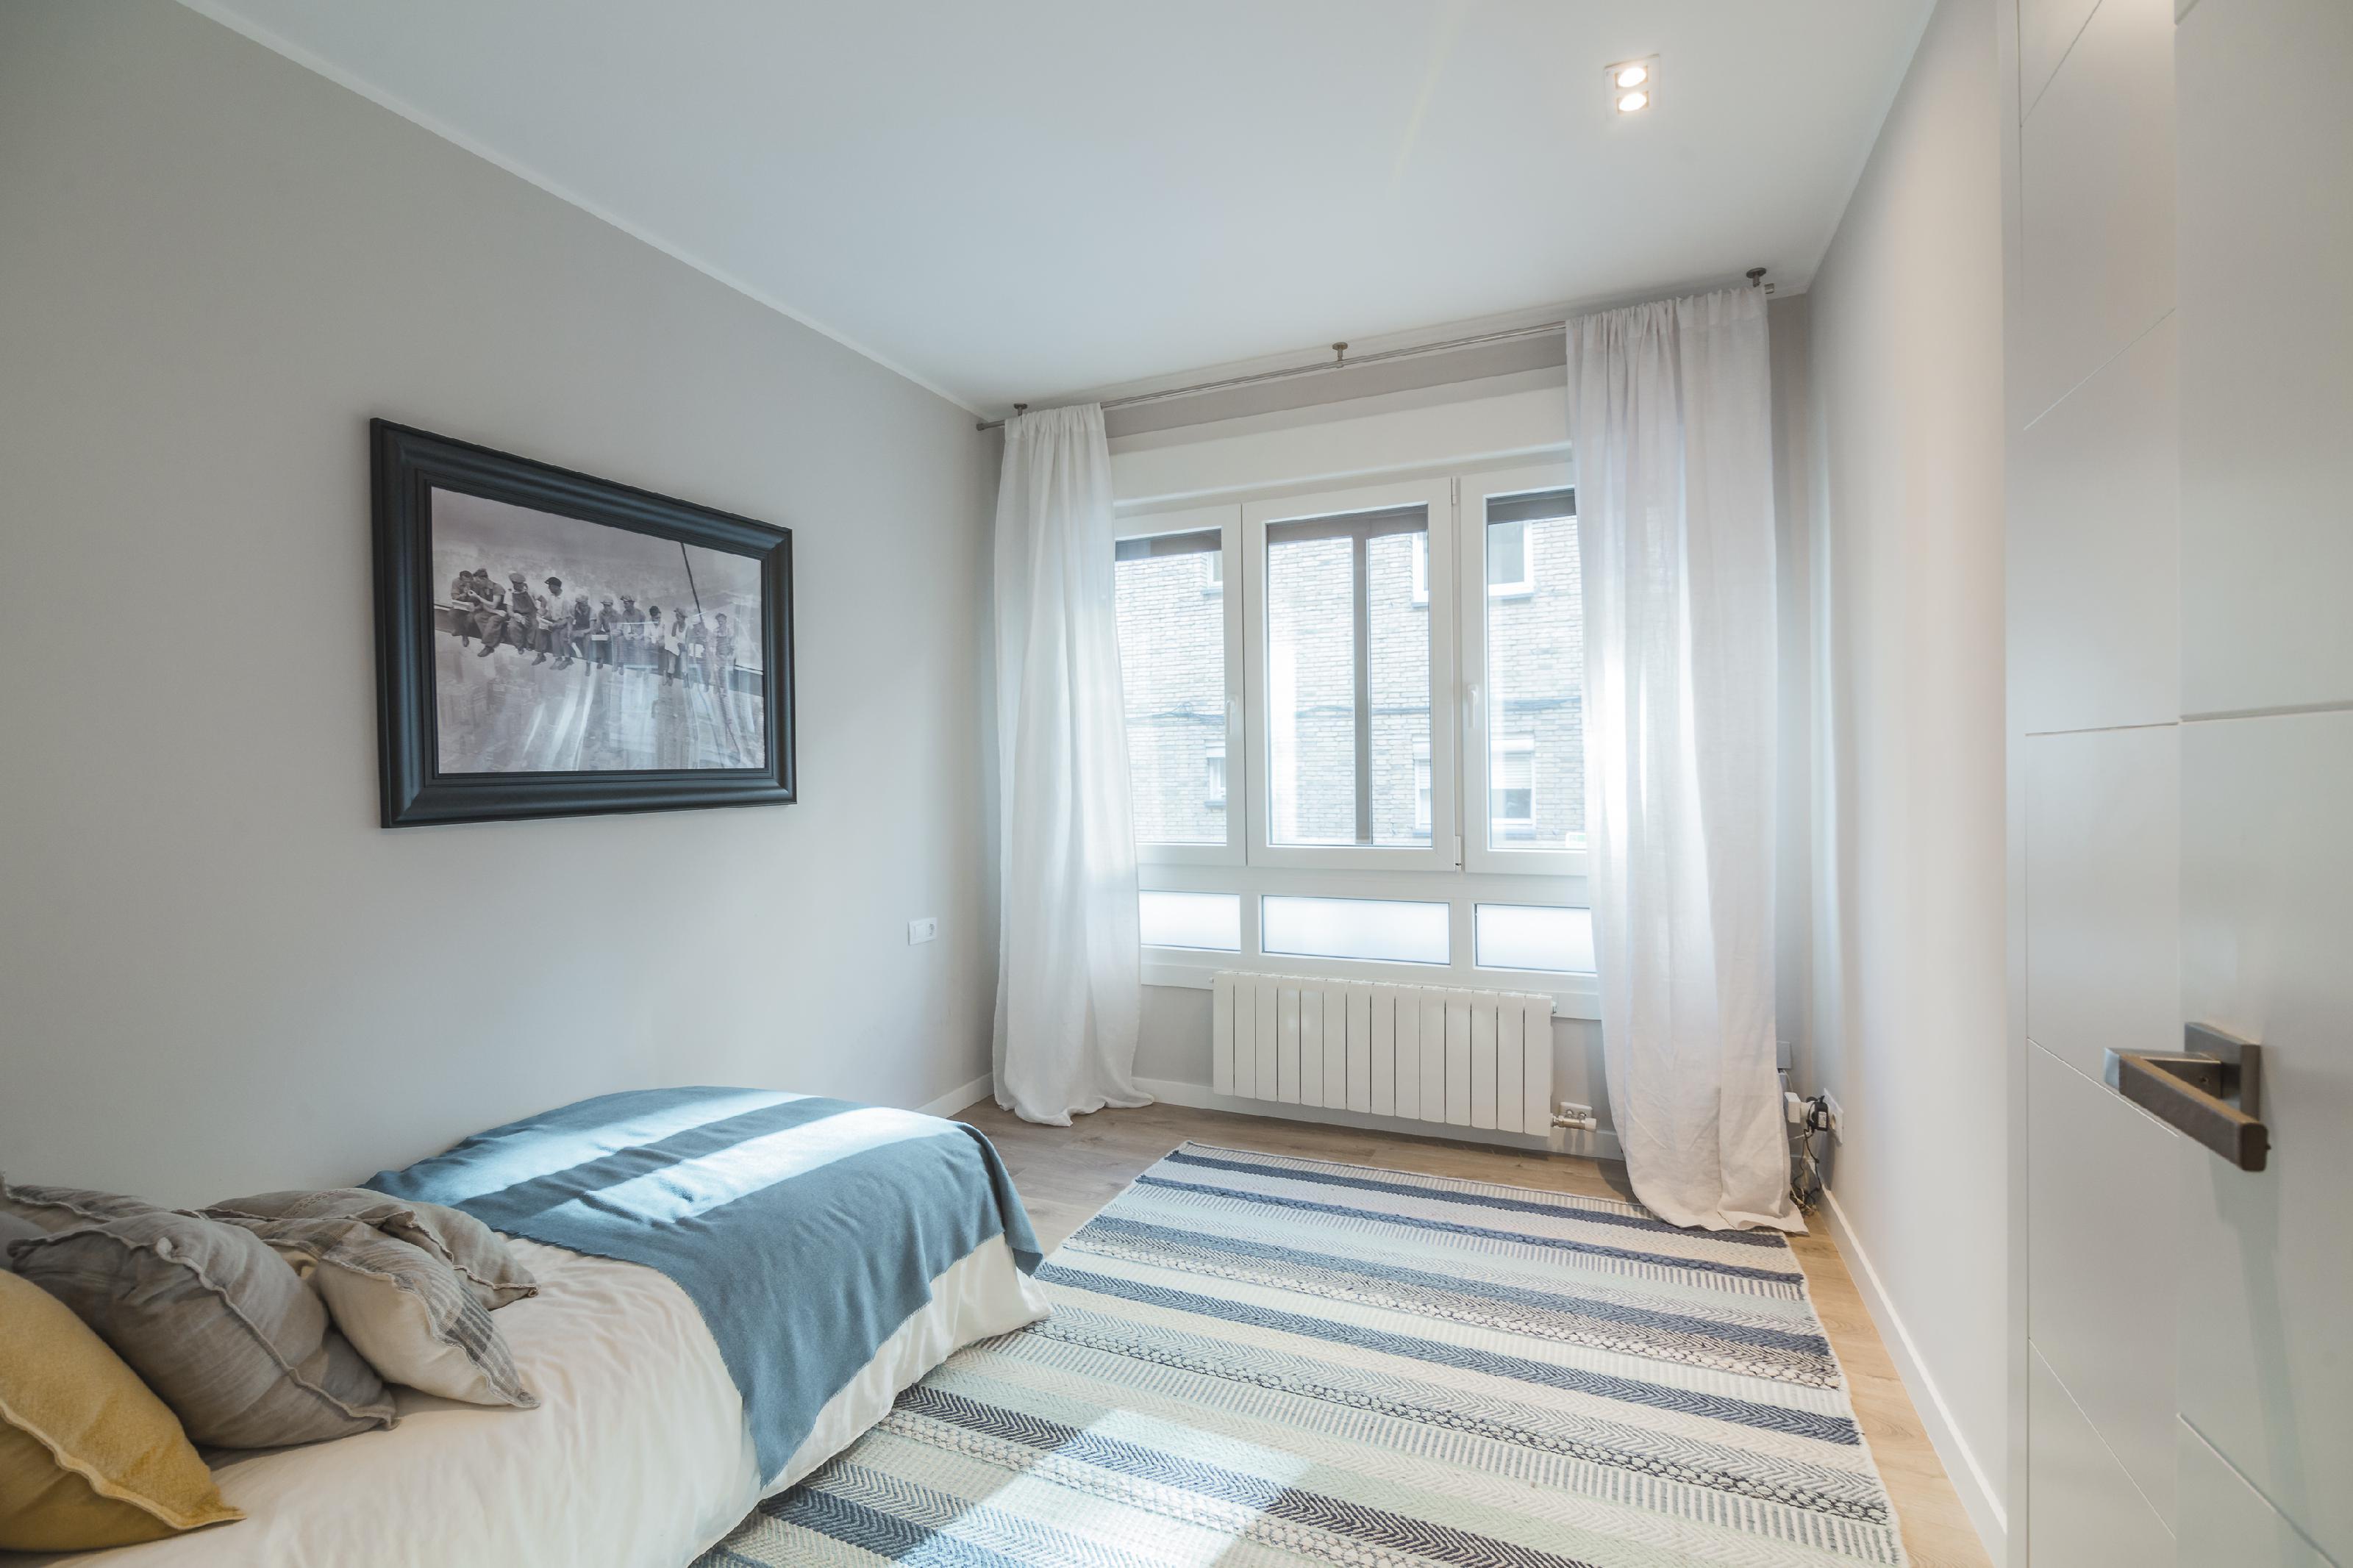 244392 Flat for sale in Sarrià-Sant Gervasi, Sant Gervasi-Galvany 27